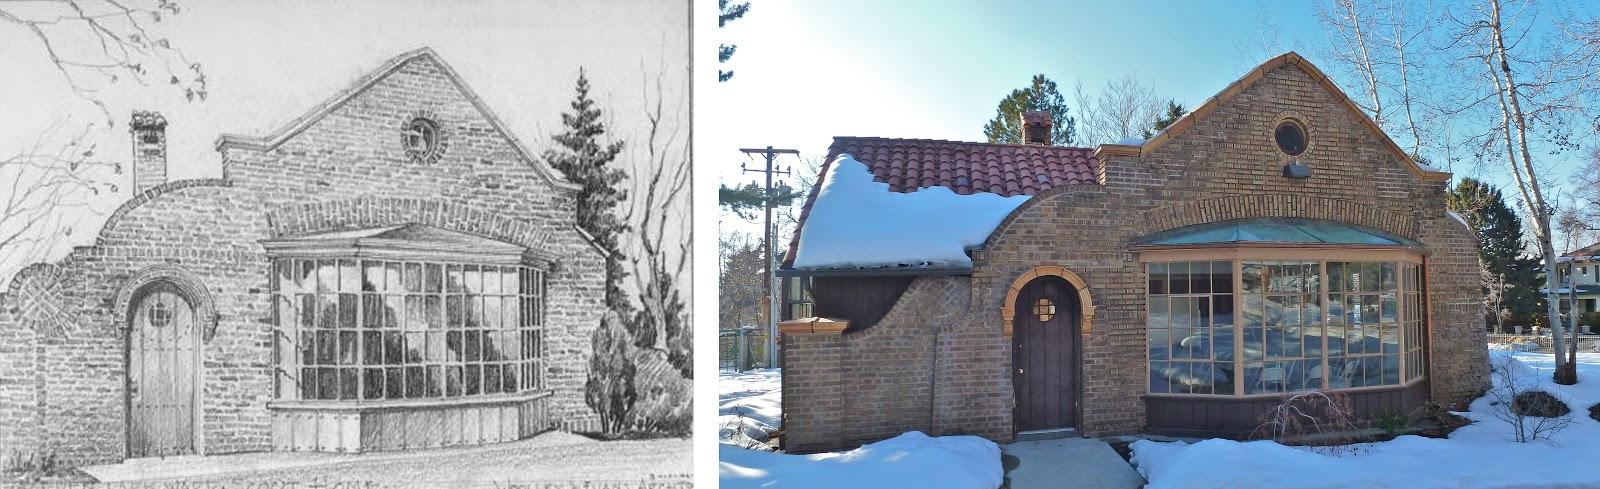 Utah's Present History: Salt Lake City Garden Park Ward